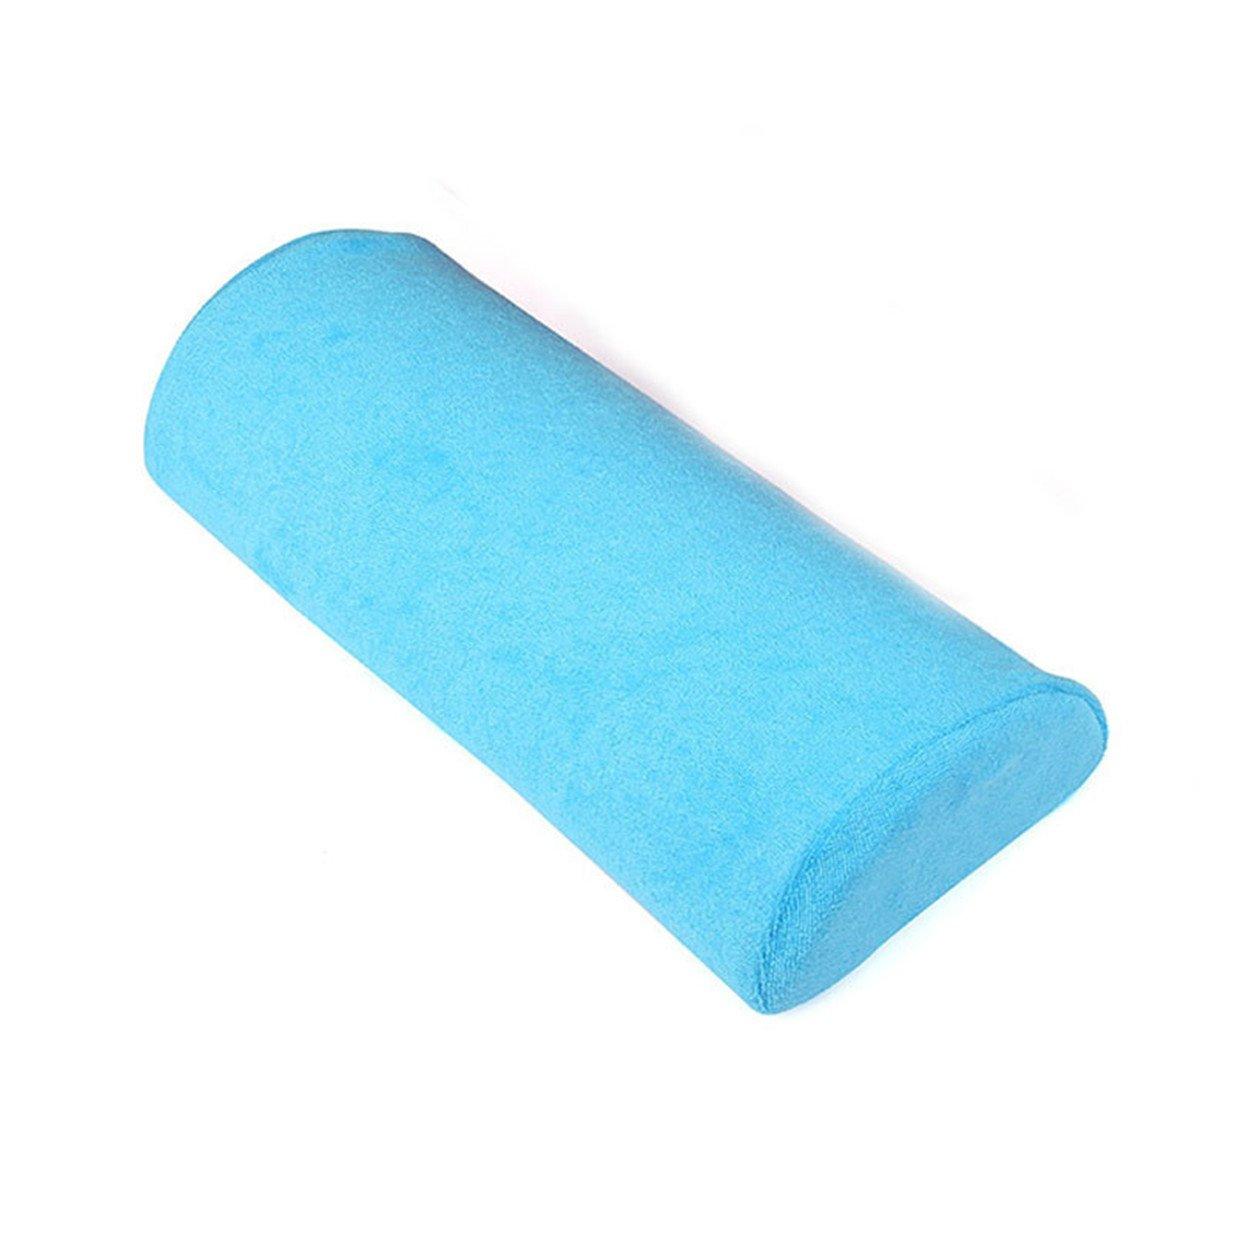 Lalang Repose Main Coussin Pour Nail Art Salon Manucure Bleu